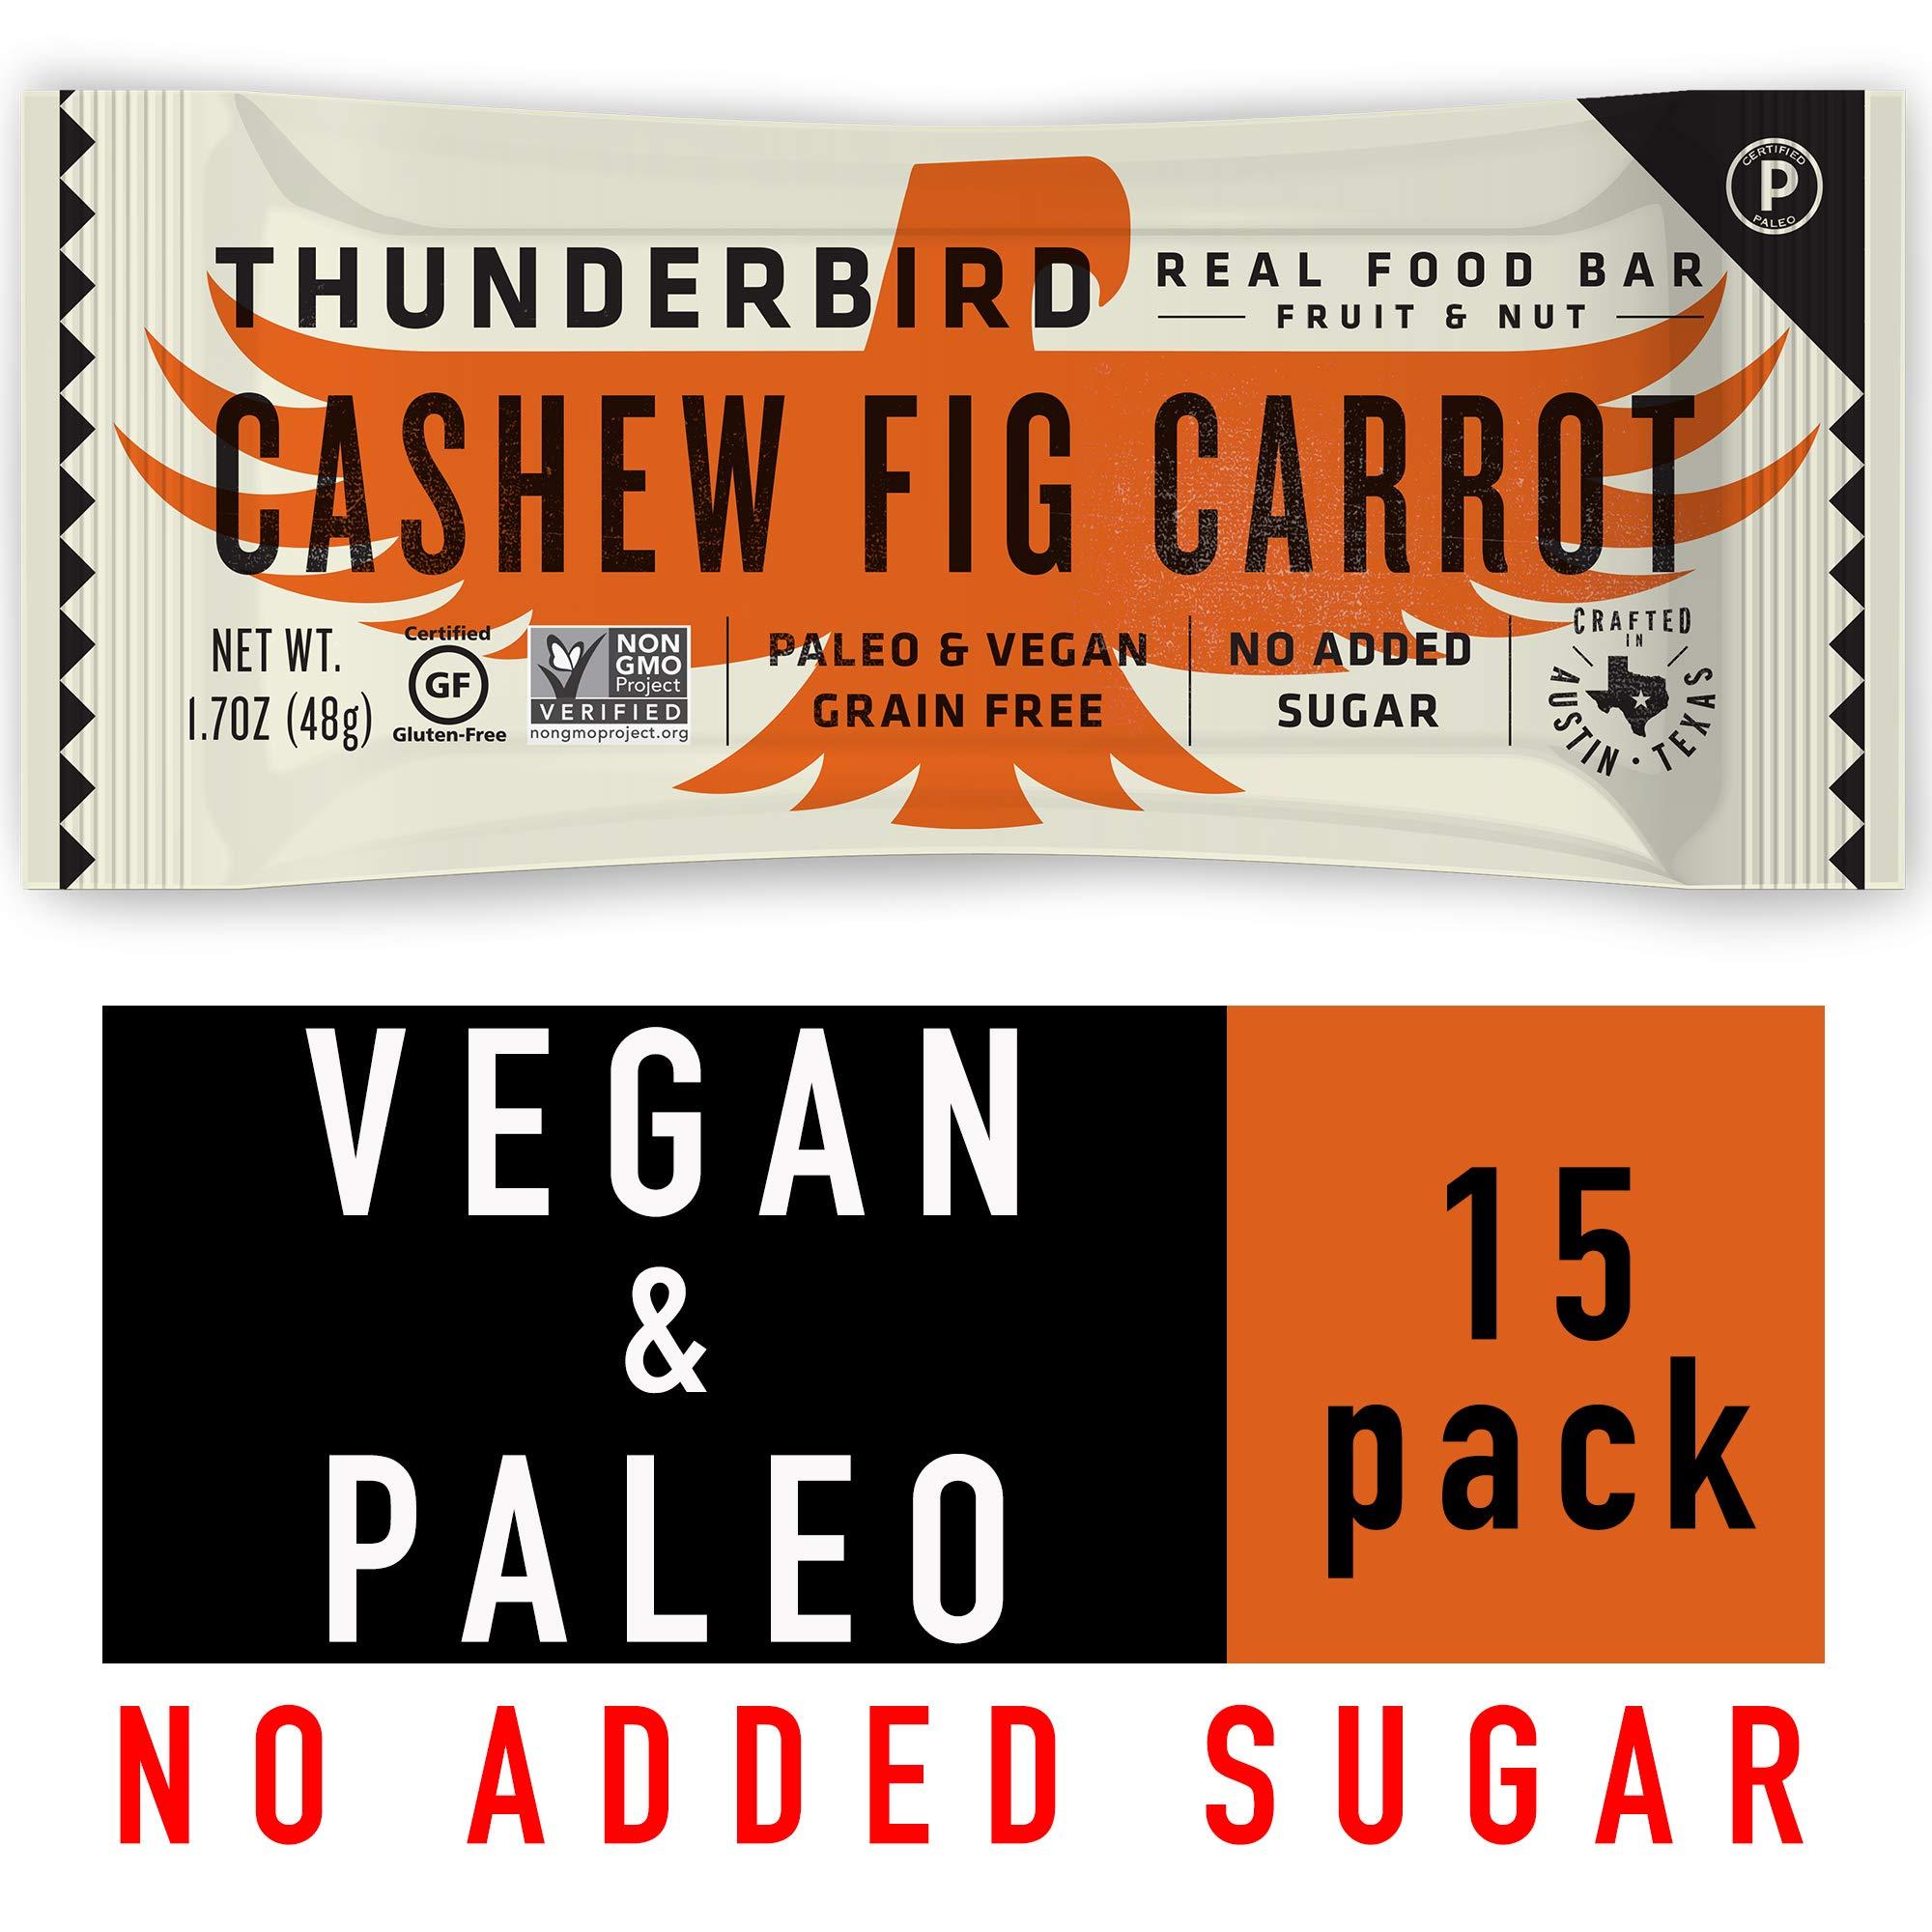 Thunderbird Paleo and Vegan Snacks - Real Food Energy Bars - Cashew Fig Carrot - Box of 15 - No Added Sugar, Grain and Gluten Free, Non-GMO by Thunderbird Real Food Bars